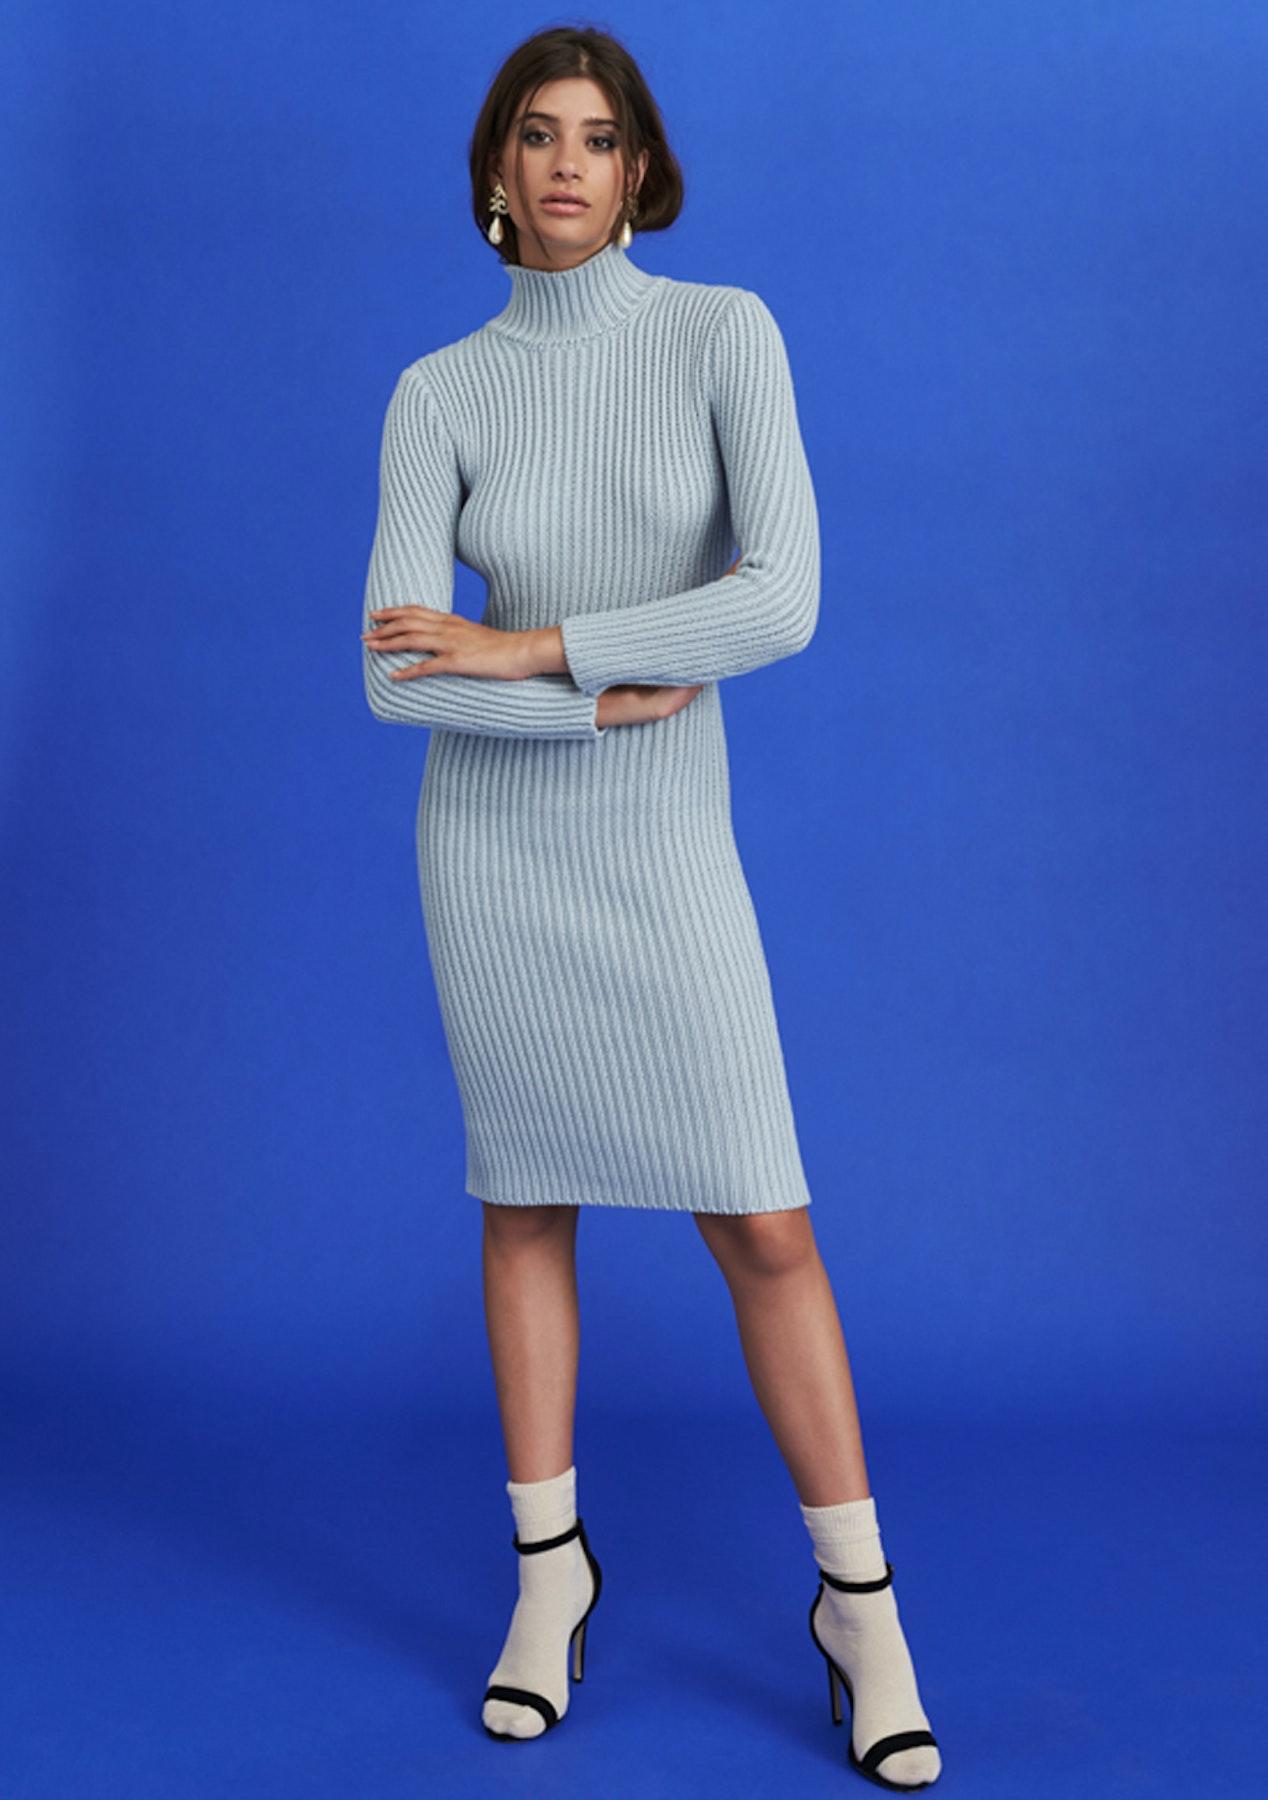 11e6838500cc Lioness - Manhattan Knit Dress - Cloud Grey - Express Shipping Bardot,  Winona & More - Onceit